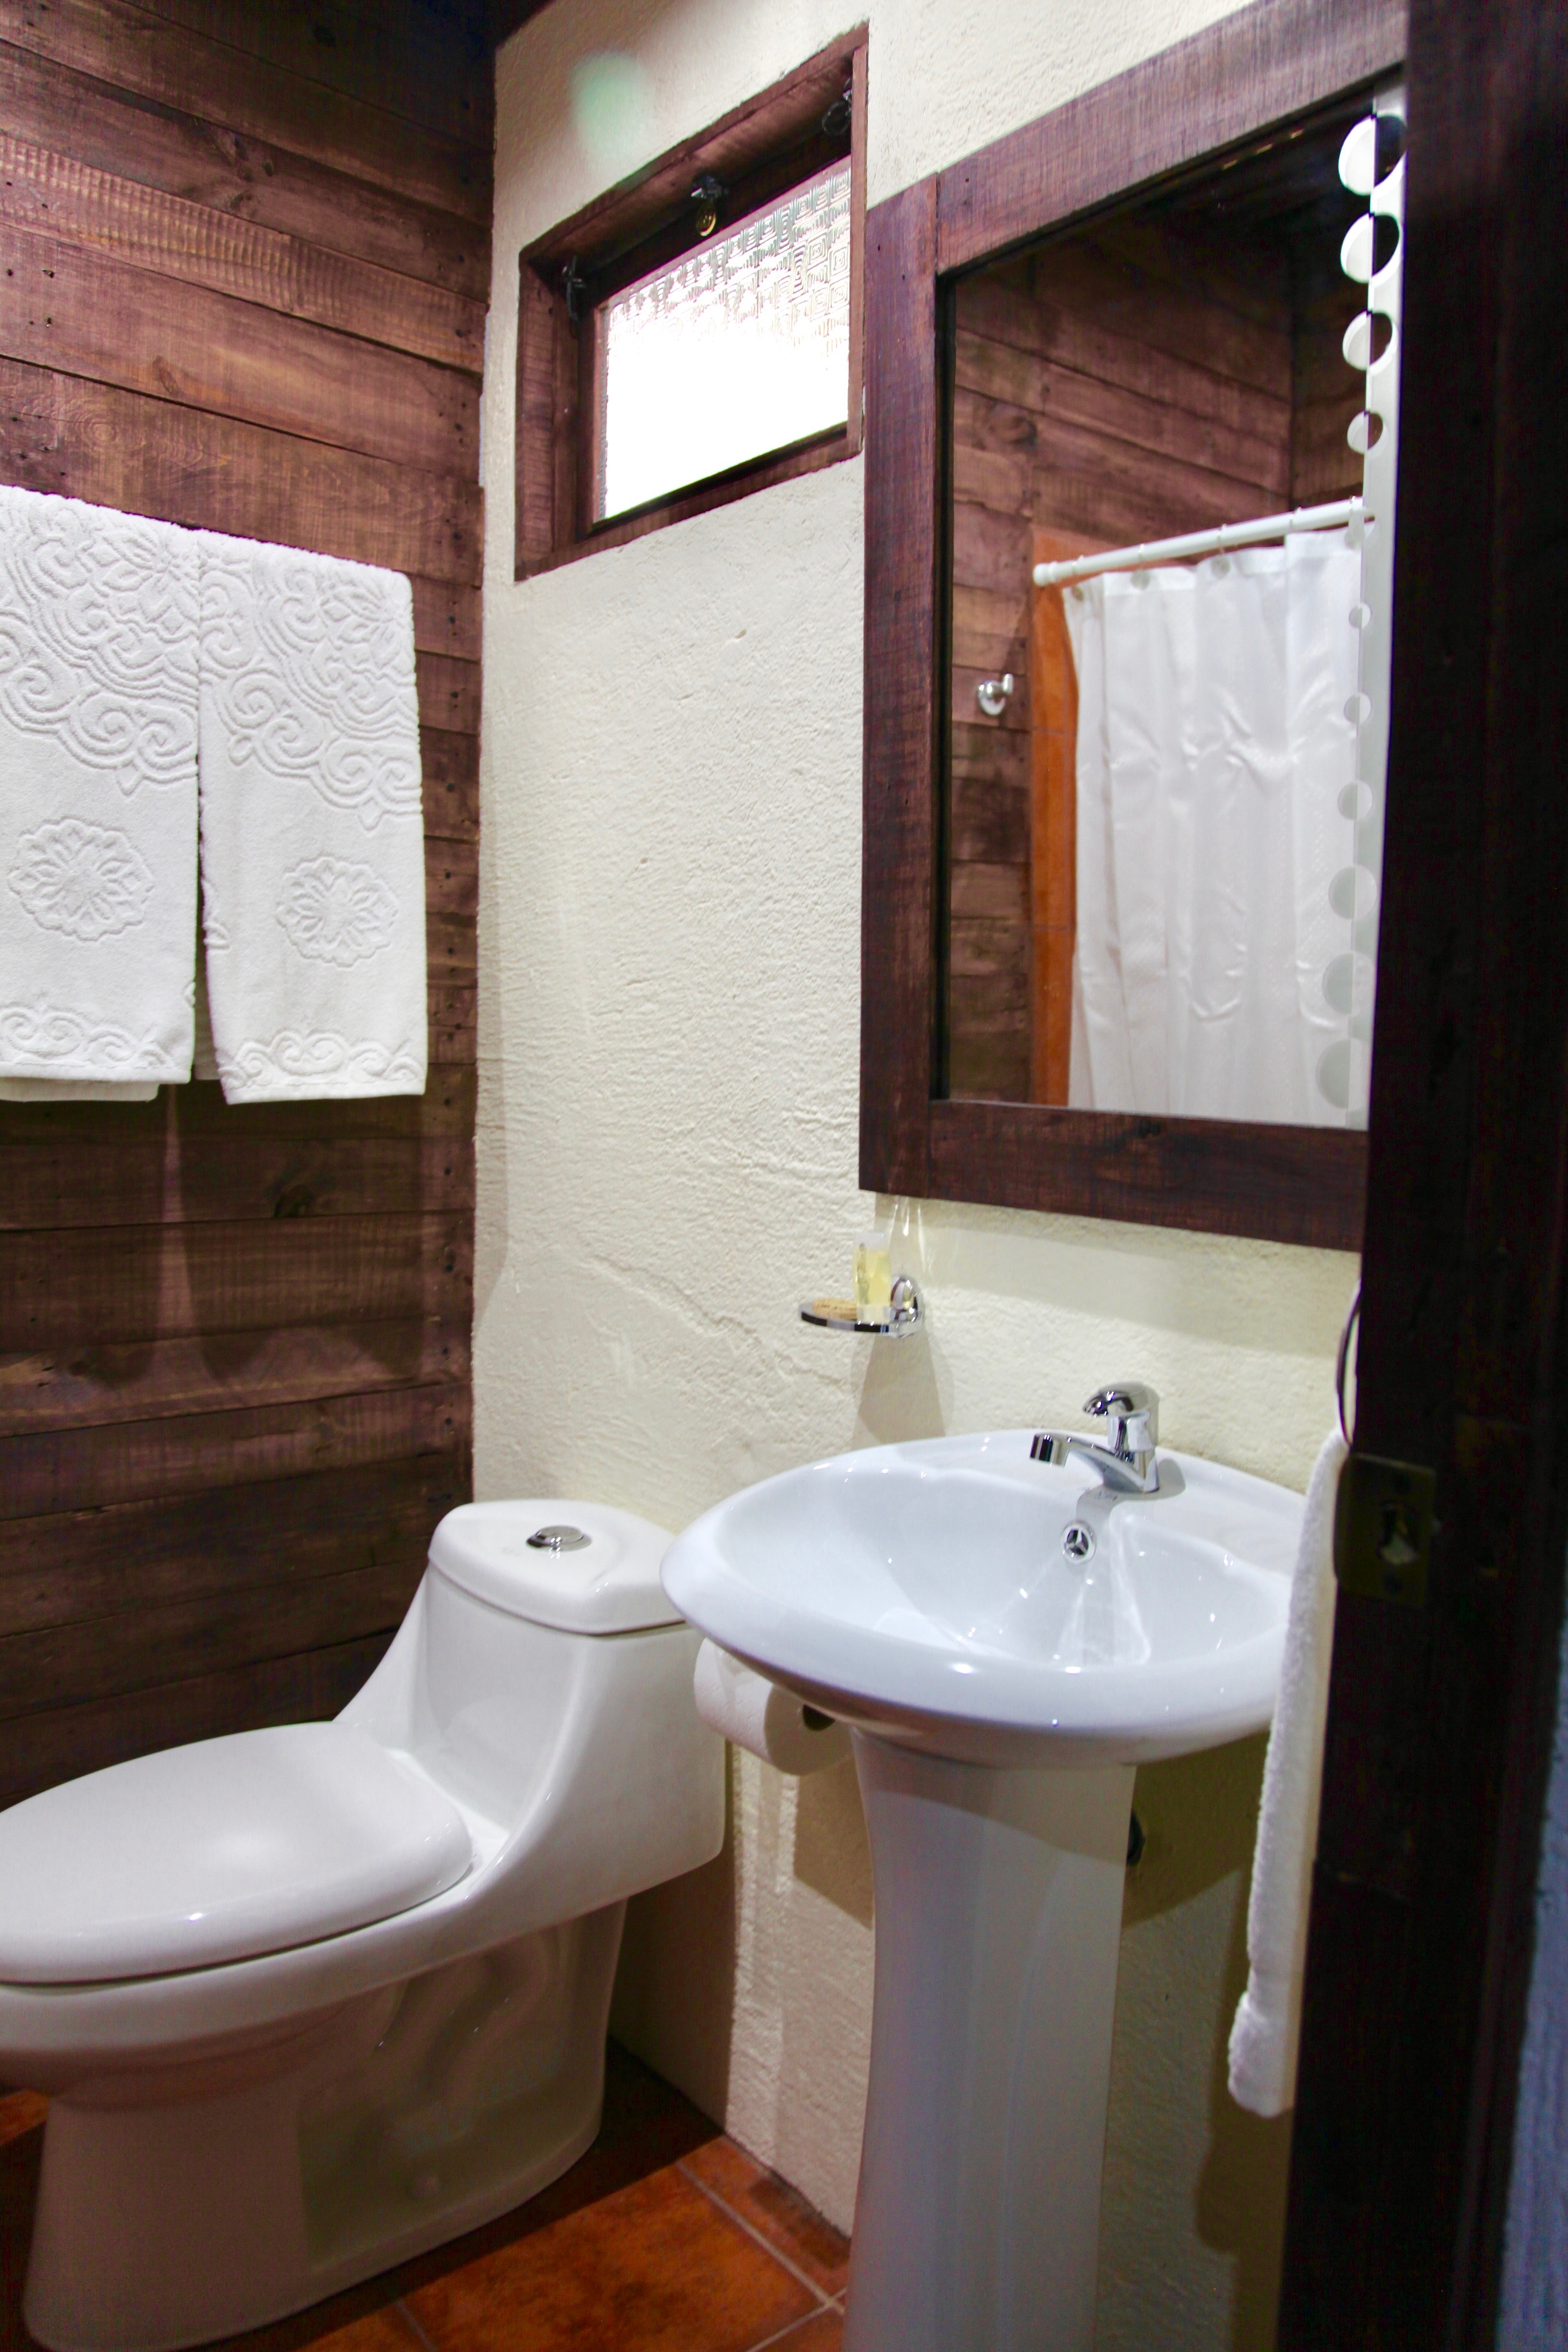 HOSTEL - Hostel Antigueno